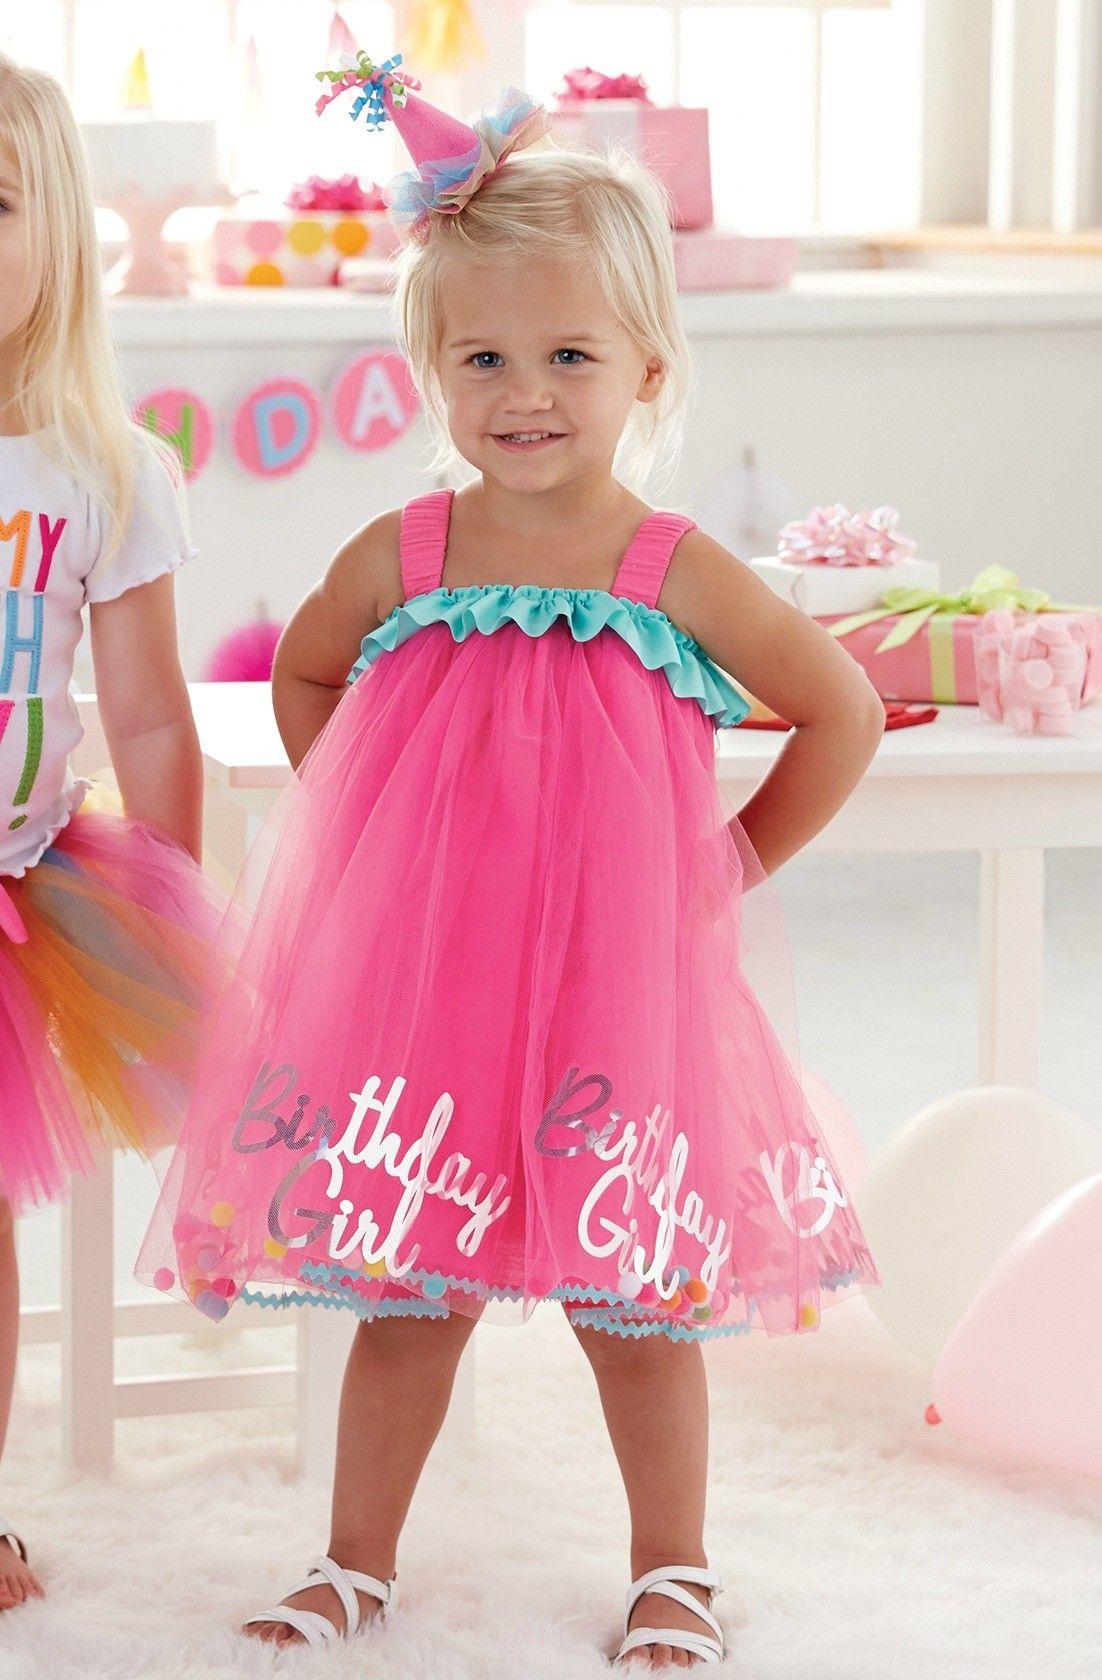 Birthday Girl Tulle Dress By Mud Pie